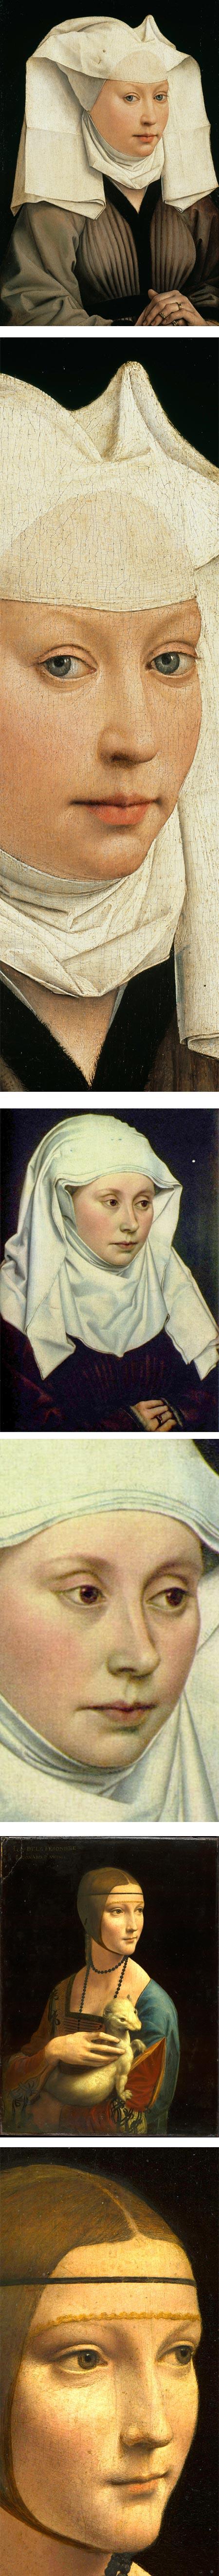 Portrait of a Woman with a Winged Bonnet, Rogier van der Wyden; Portrait of a Woman, Robert Campin; Lady with an Eermine, Leonardo da Vinci